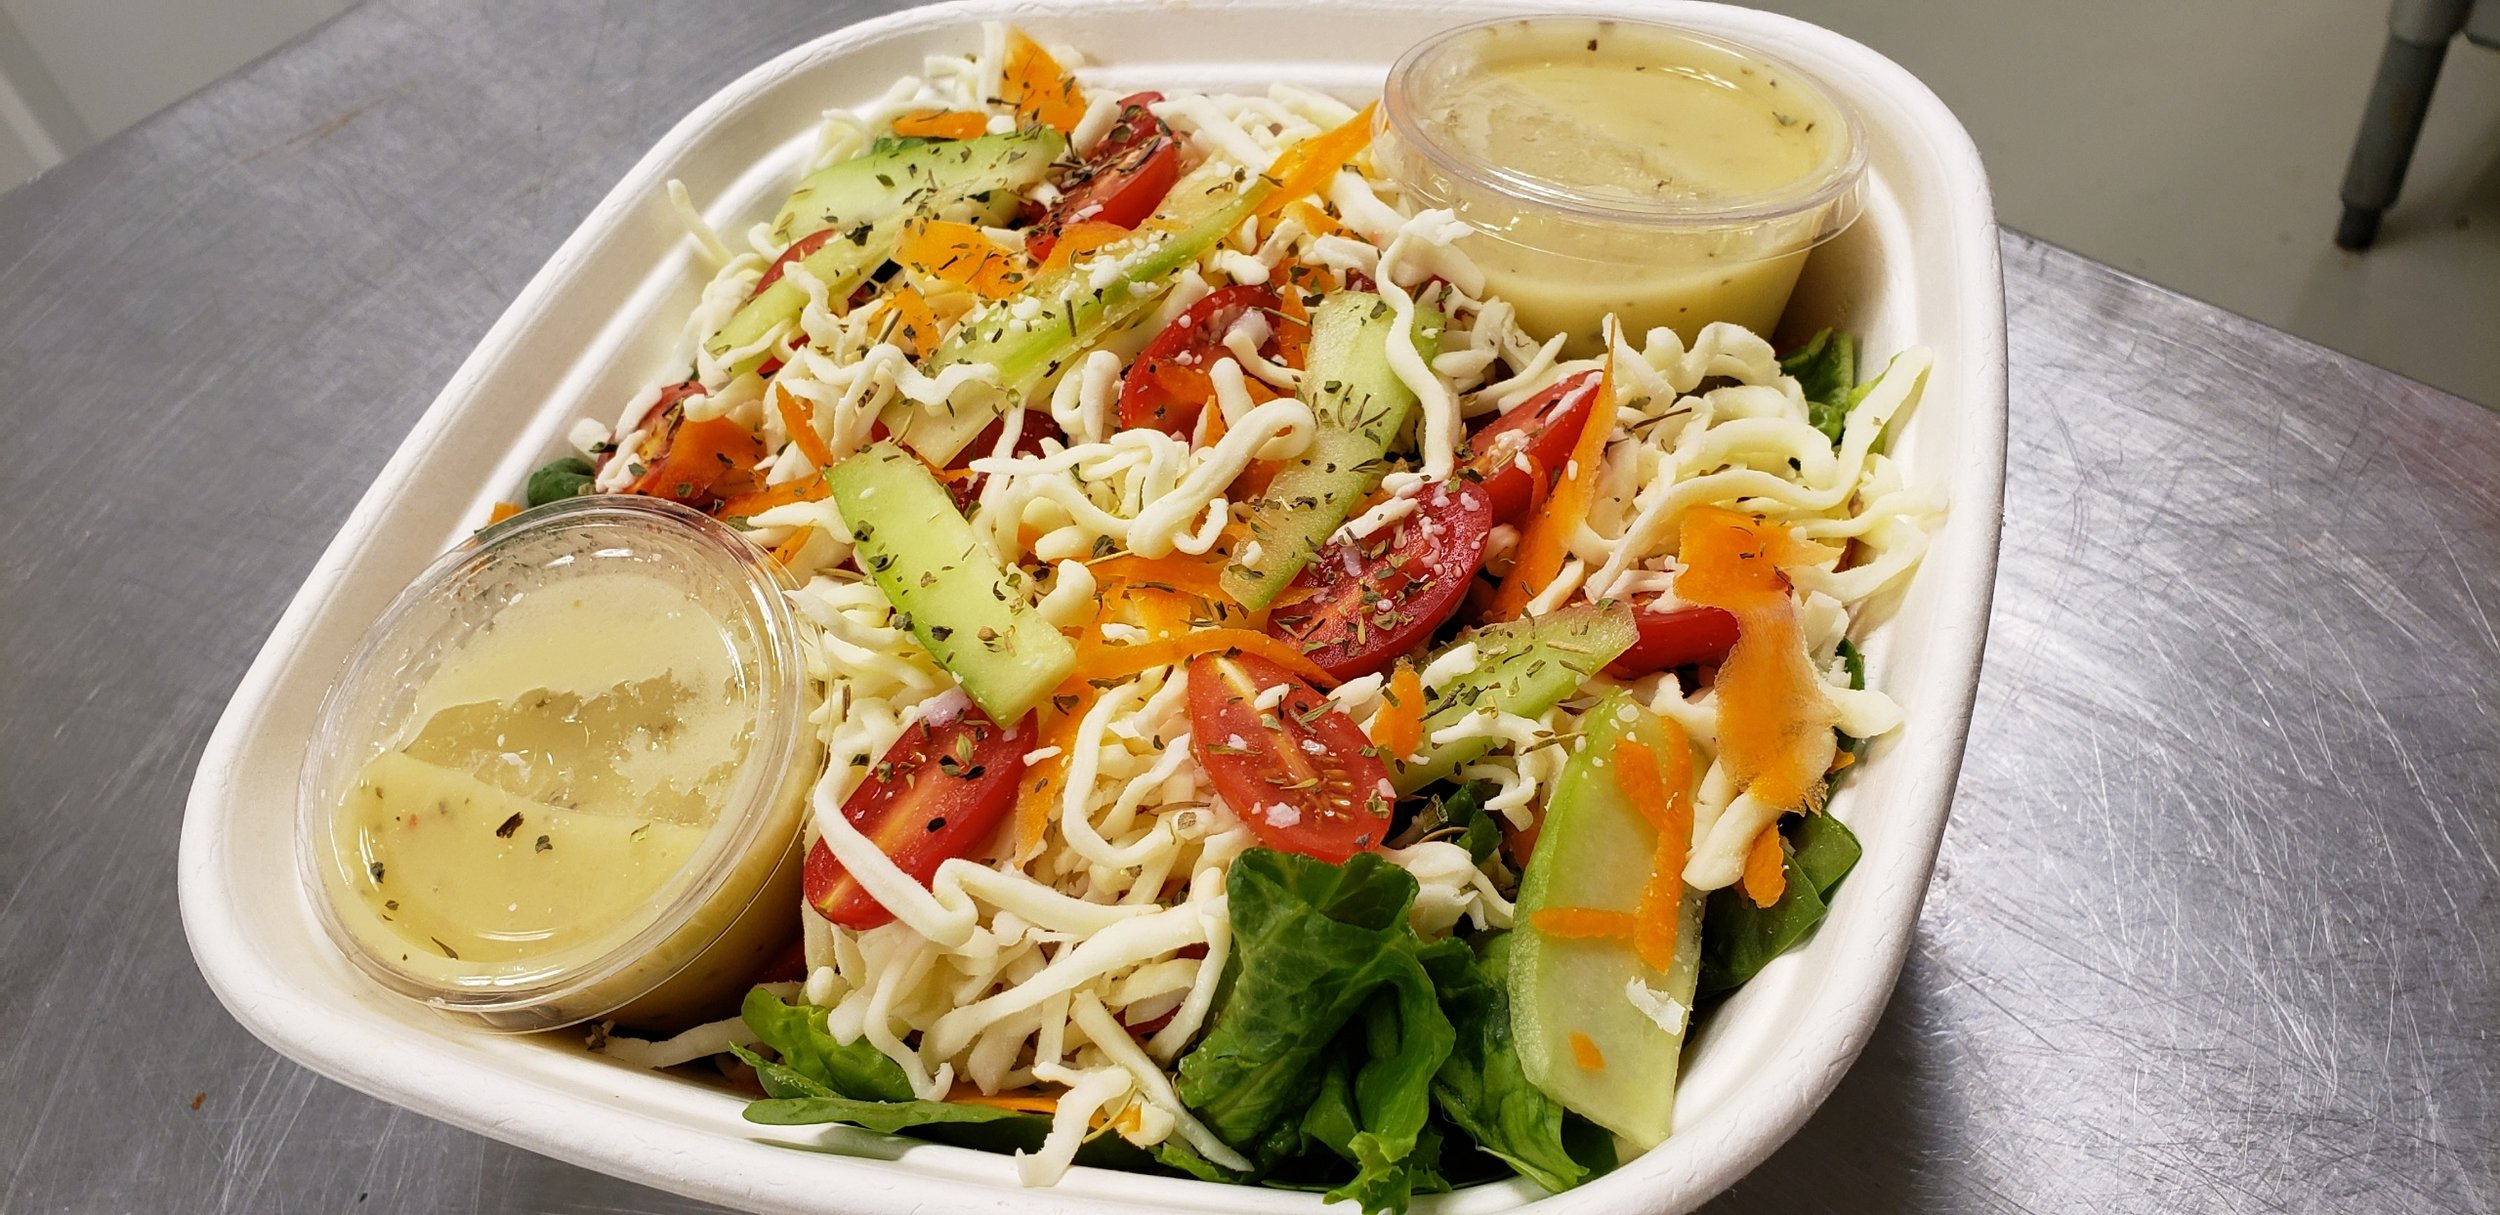 Garden Salad.jpeg